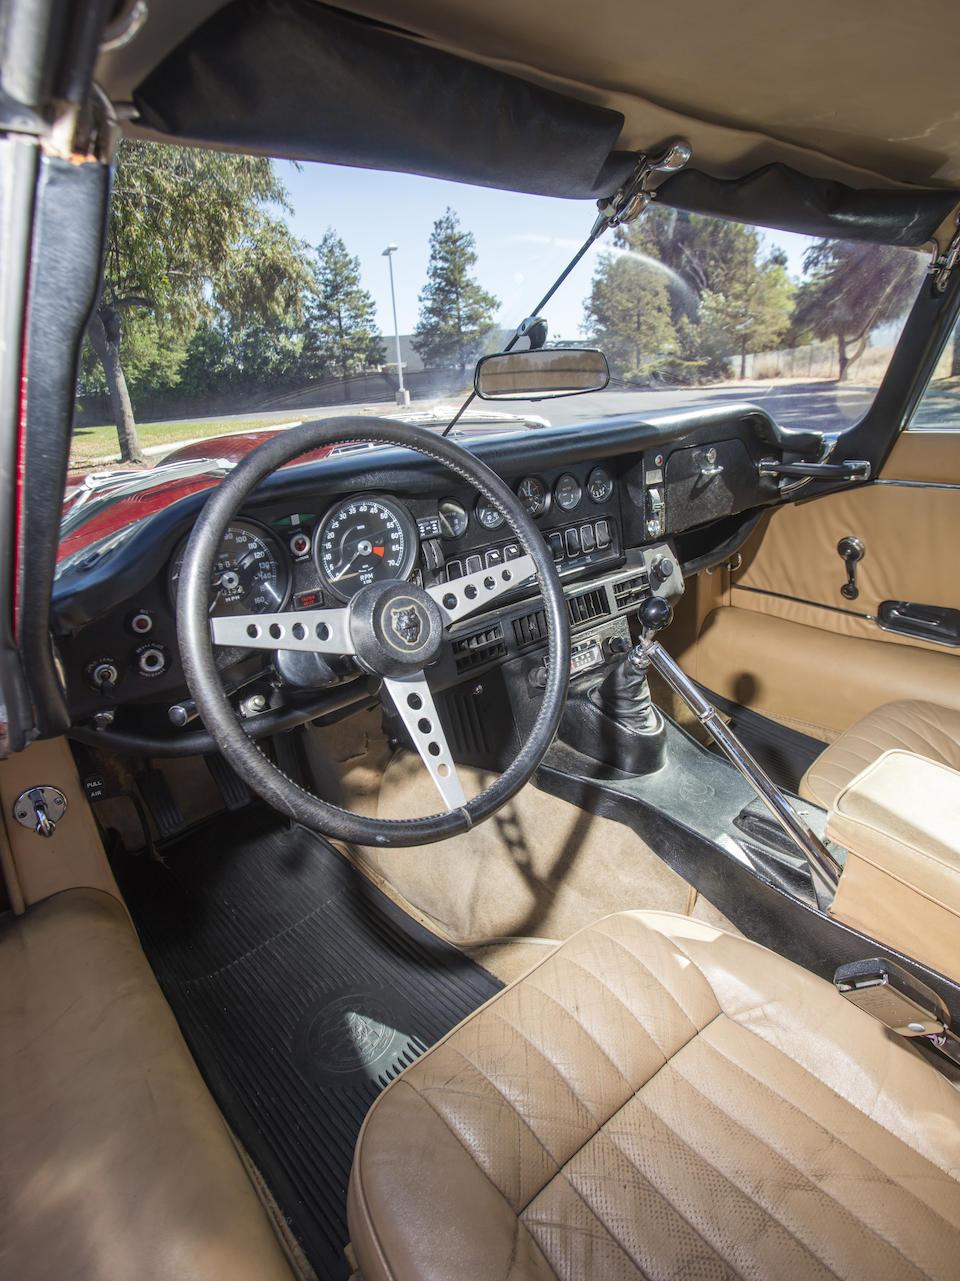 <b>1973 Jaguar E-TYPE SERIES III V12 ROADSTER</b><br />  Chassis no. UE1S23571 <br />Engine no. 7S14013LA